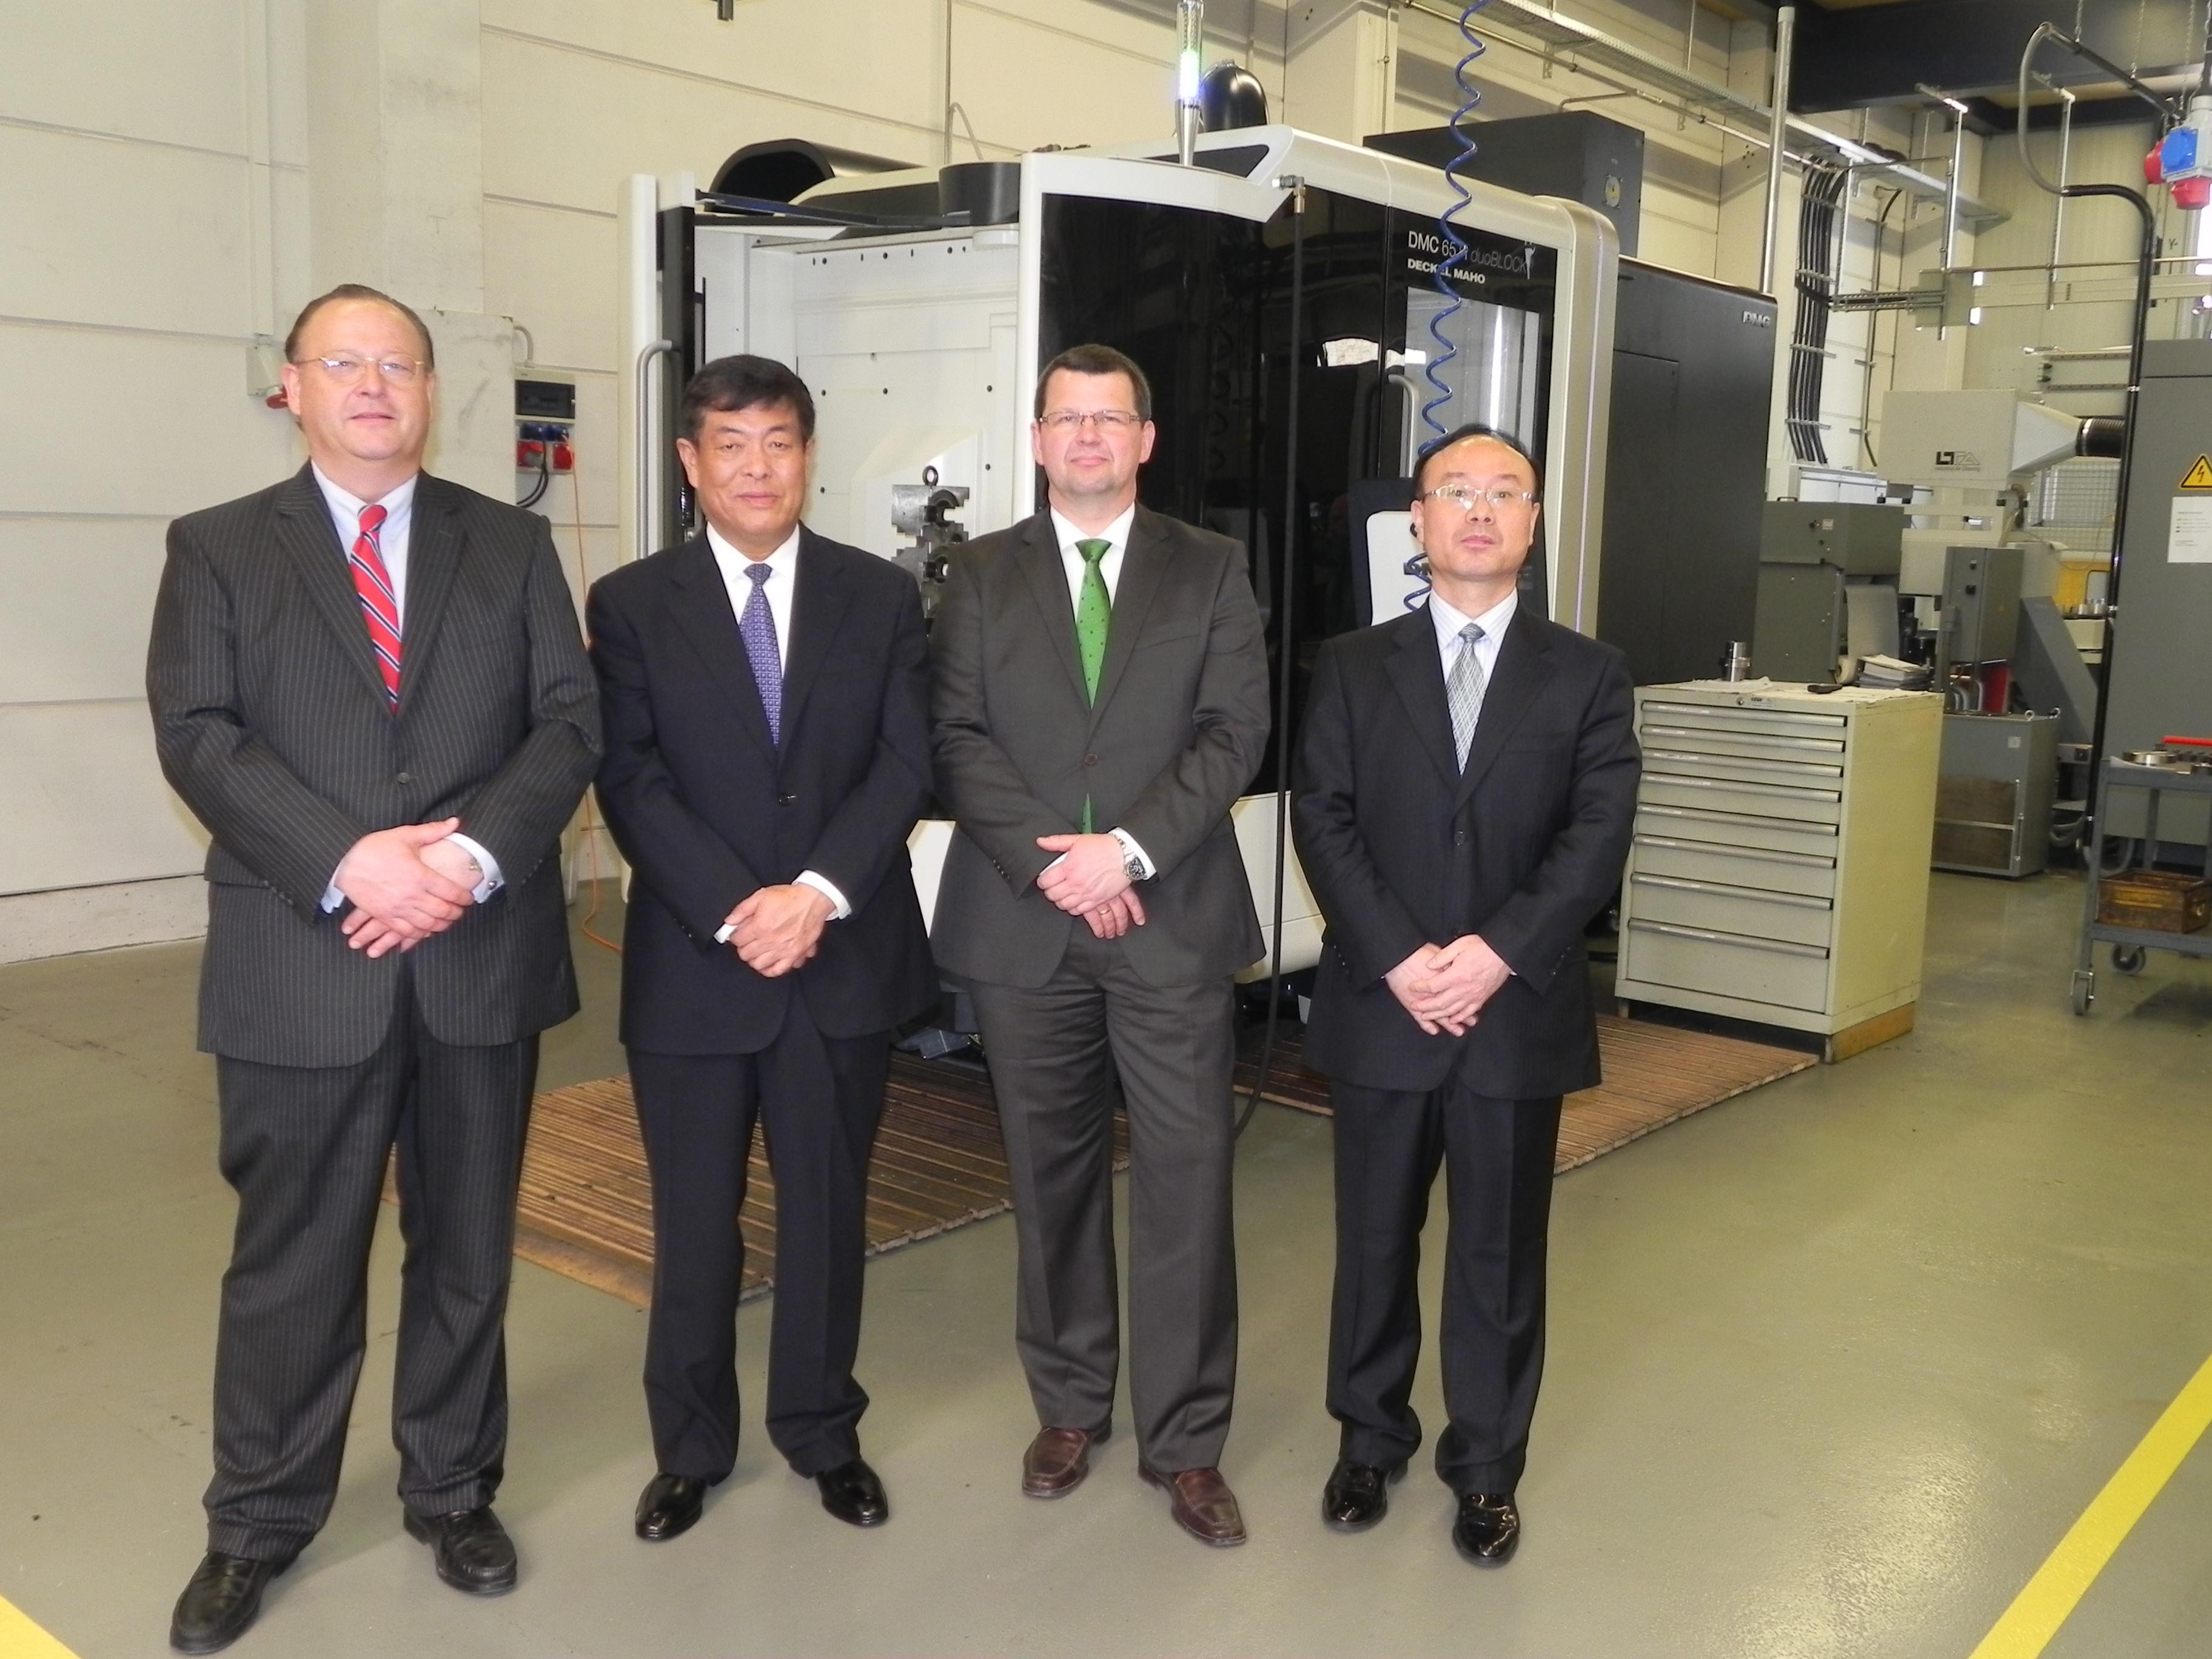 Wolfgang Kottenberg Dr Ning Song Holger Müller Hualiang Wei von links nach rechts